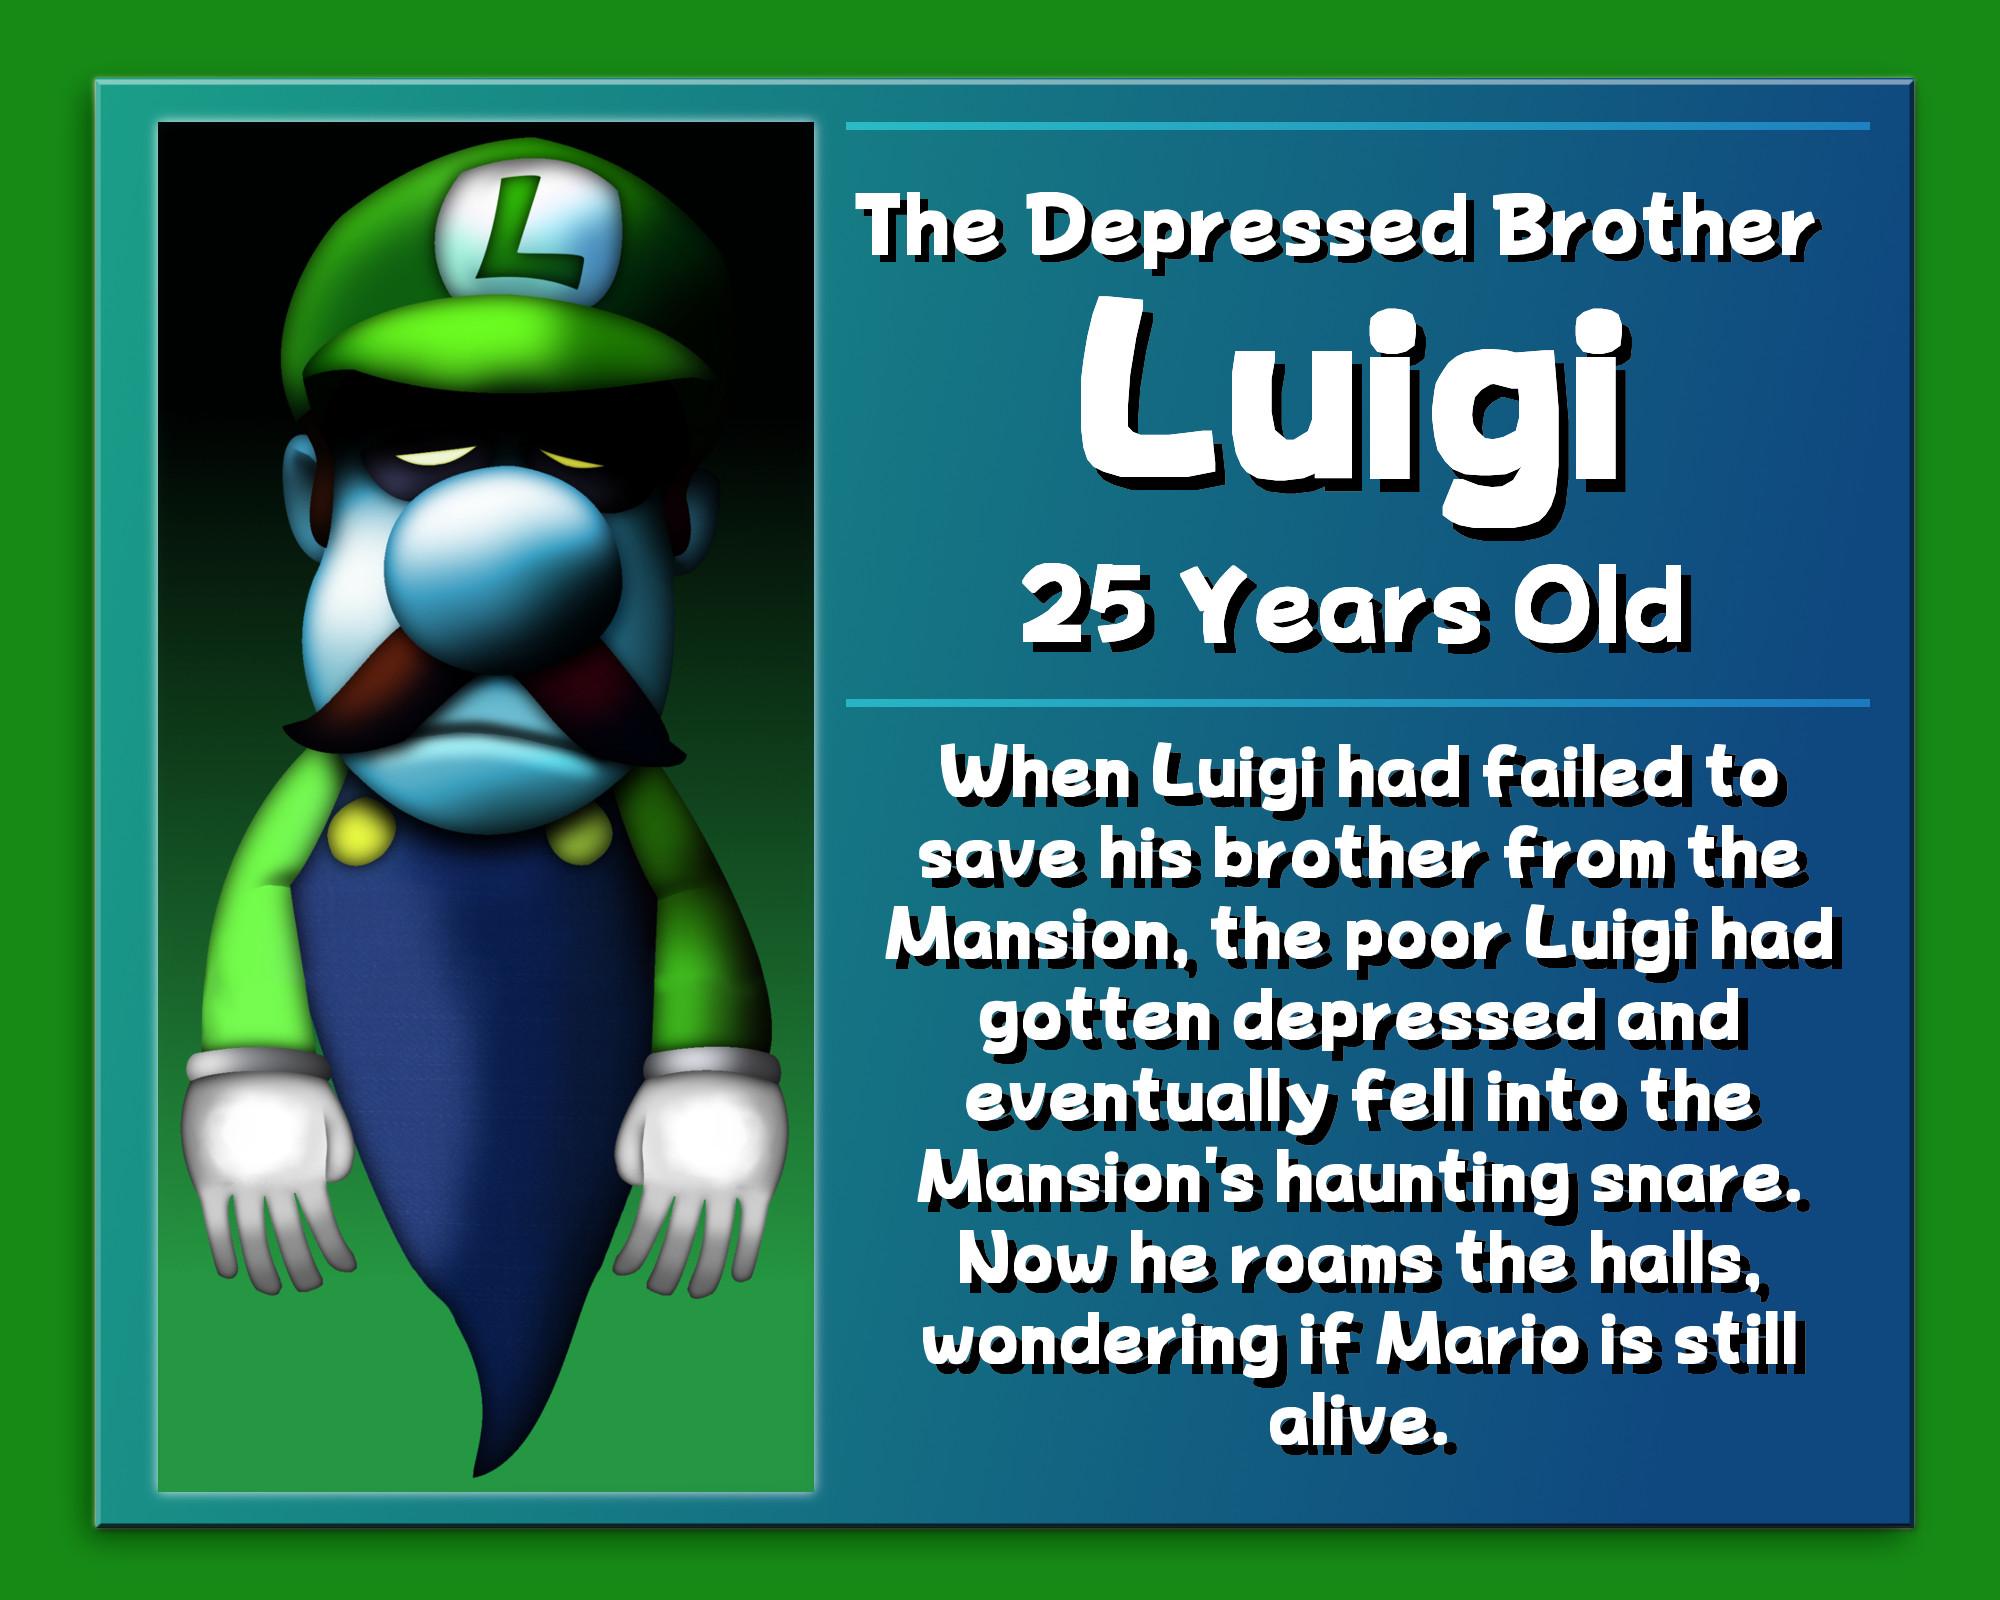 … Luigi: The Depressed Brother by GEO-GIMP